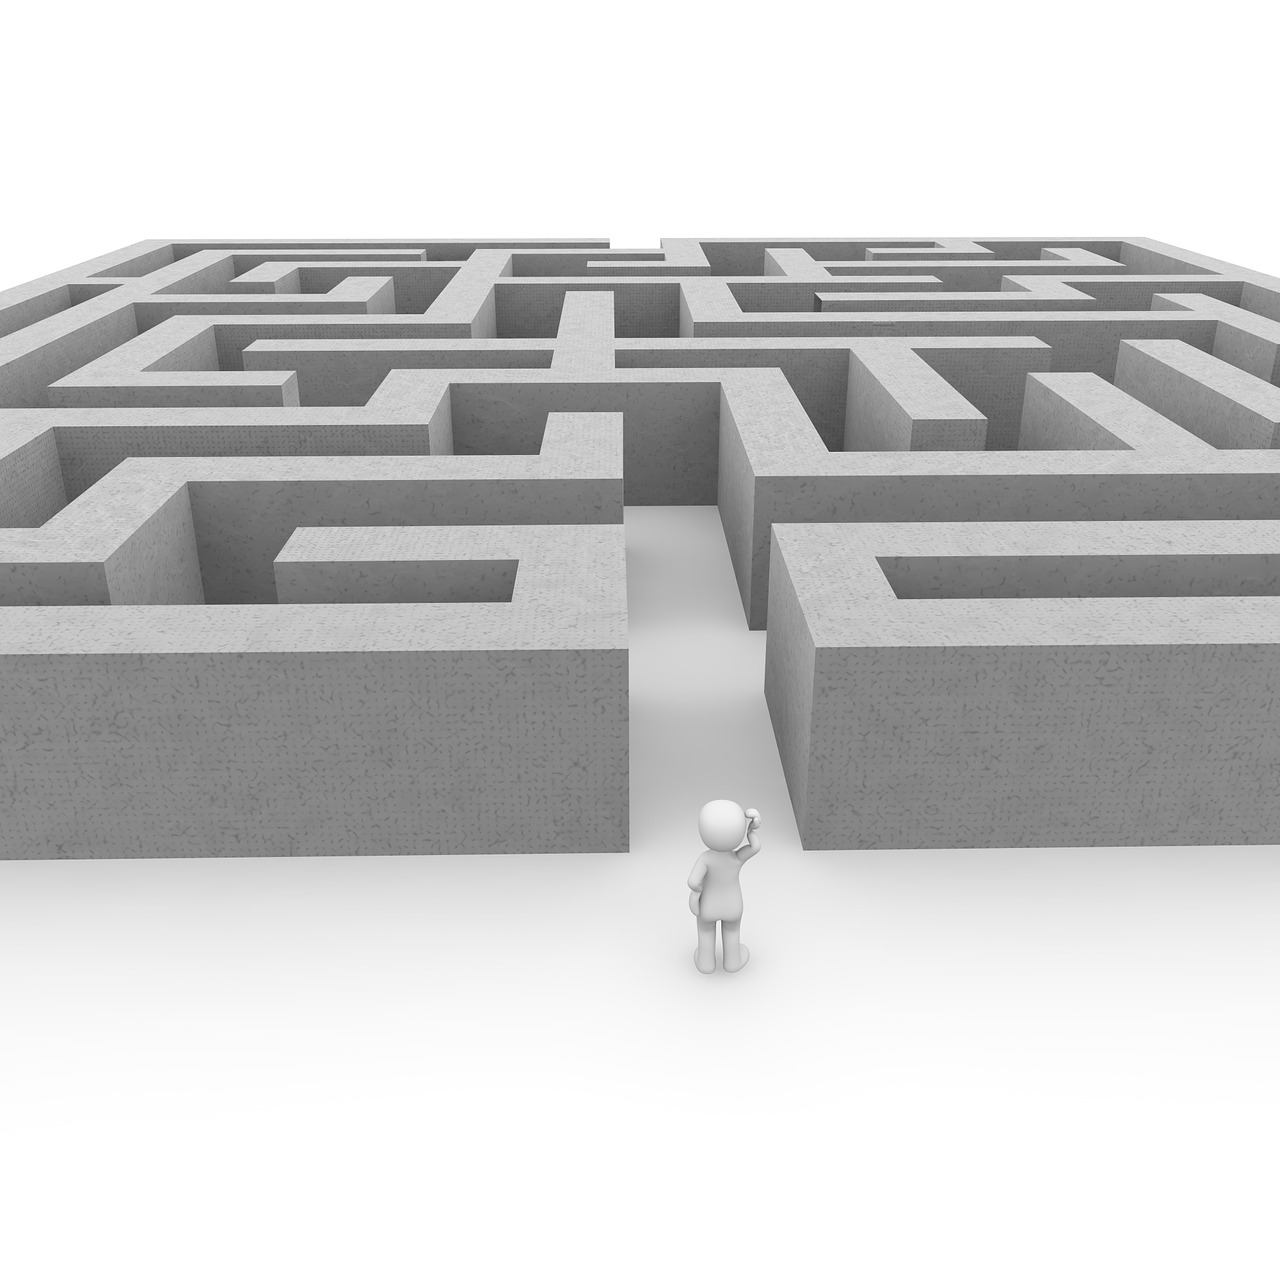 labyrinth-1013625_1280